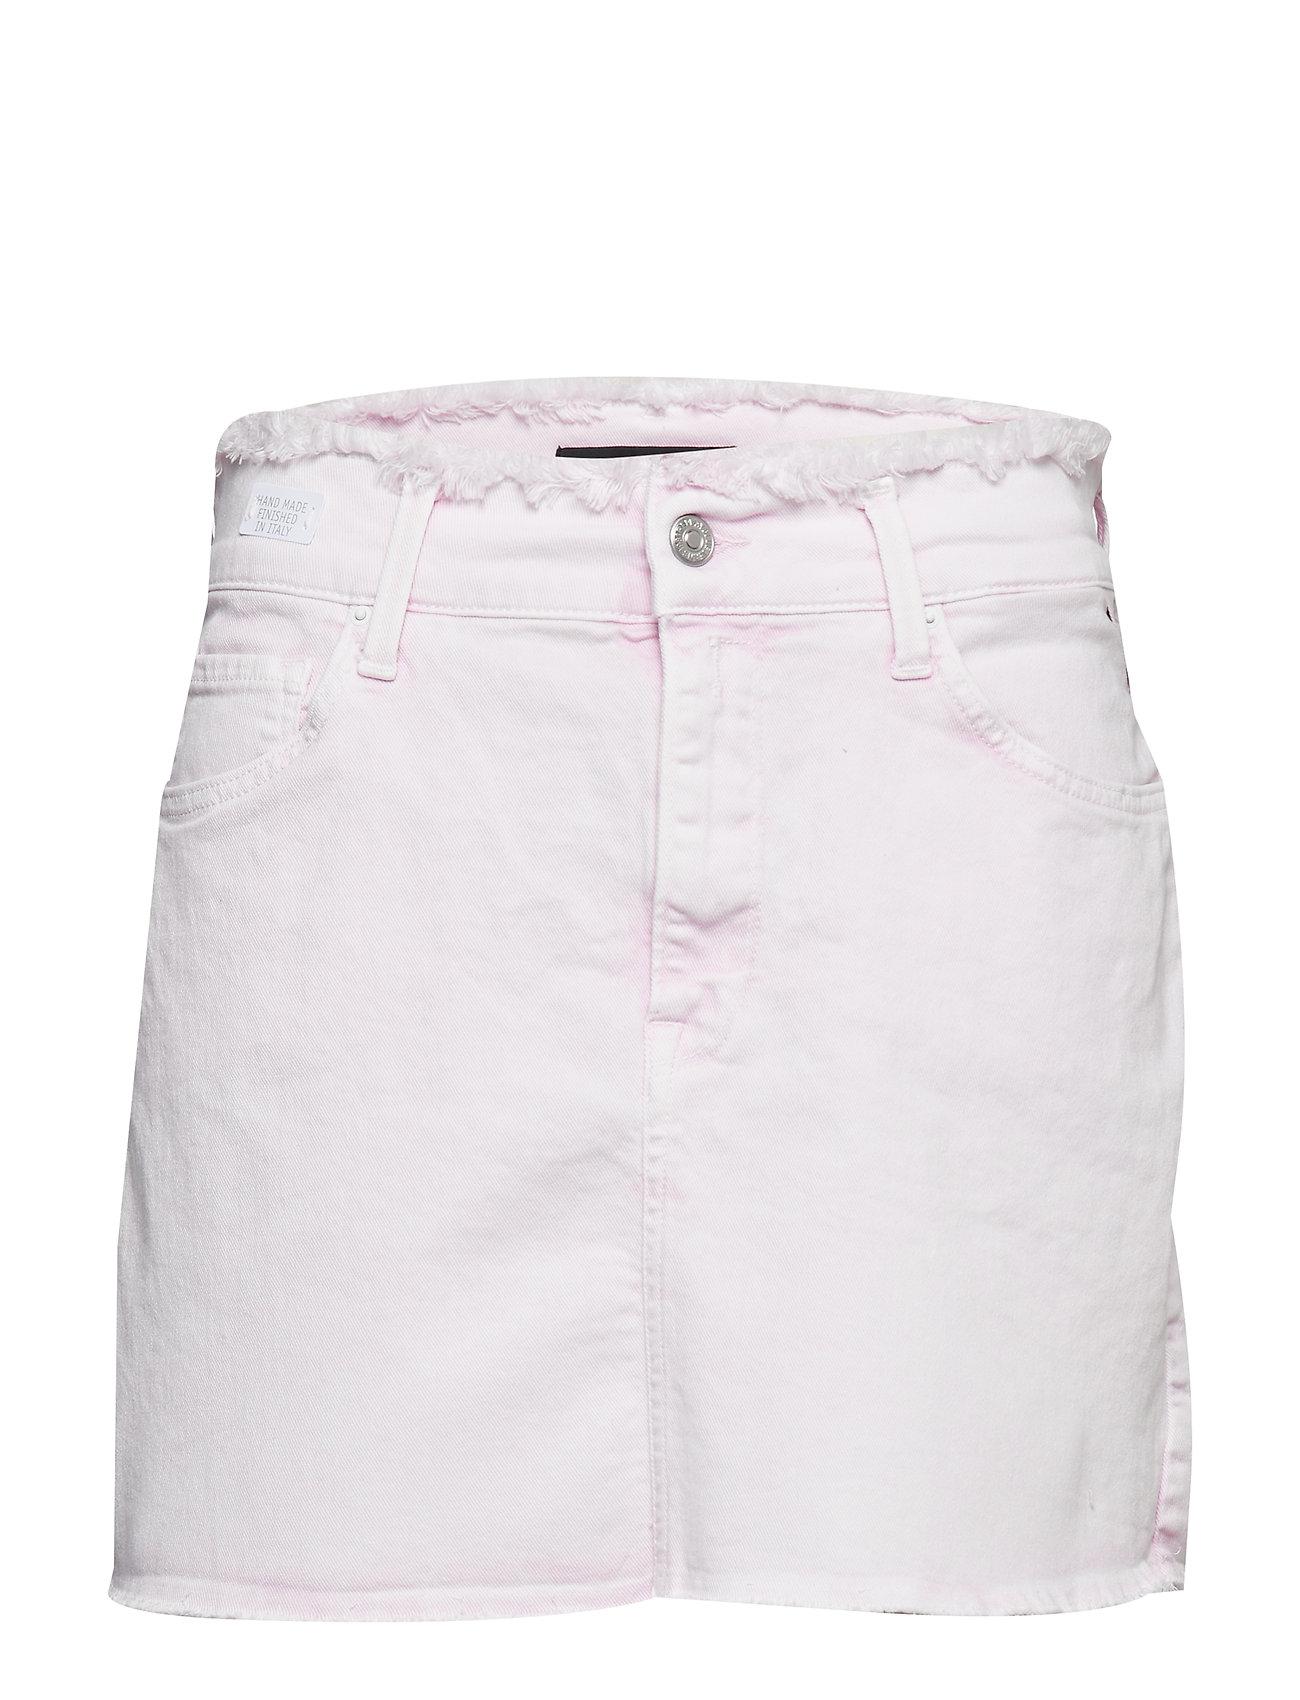 Replay Skirt - PINK